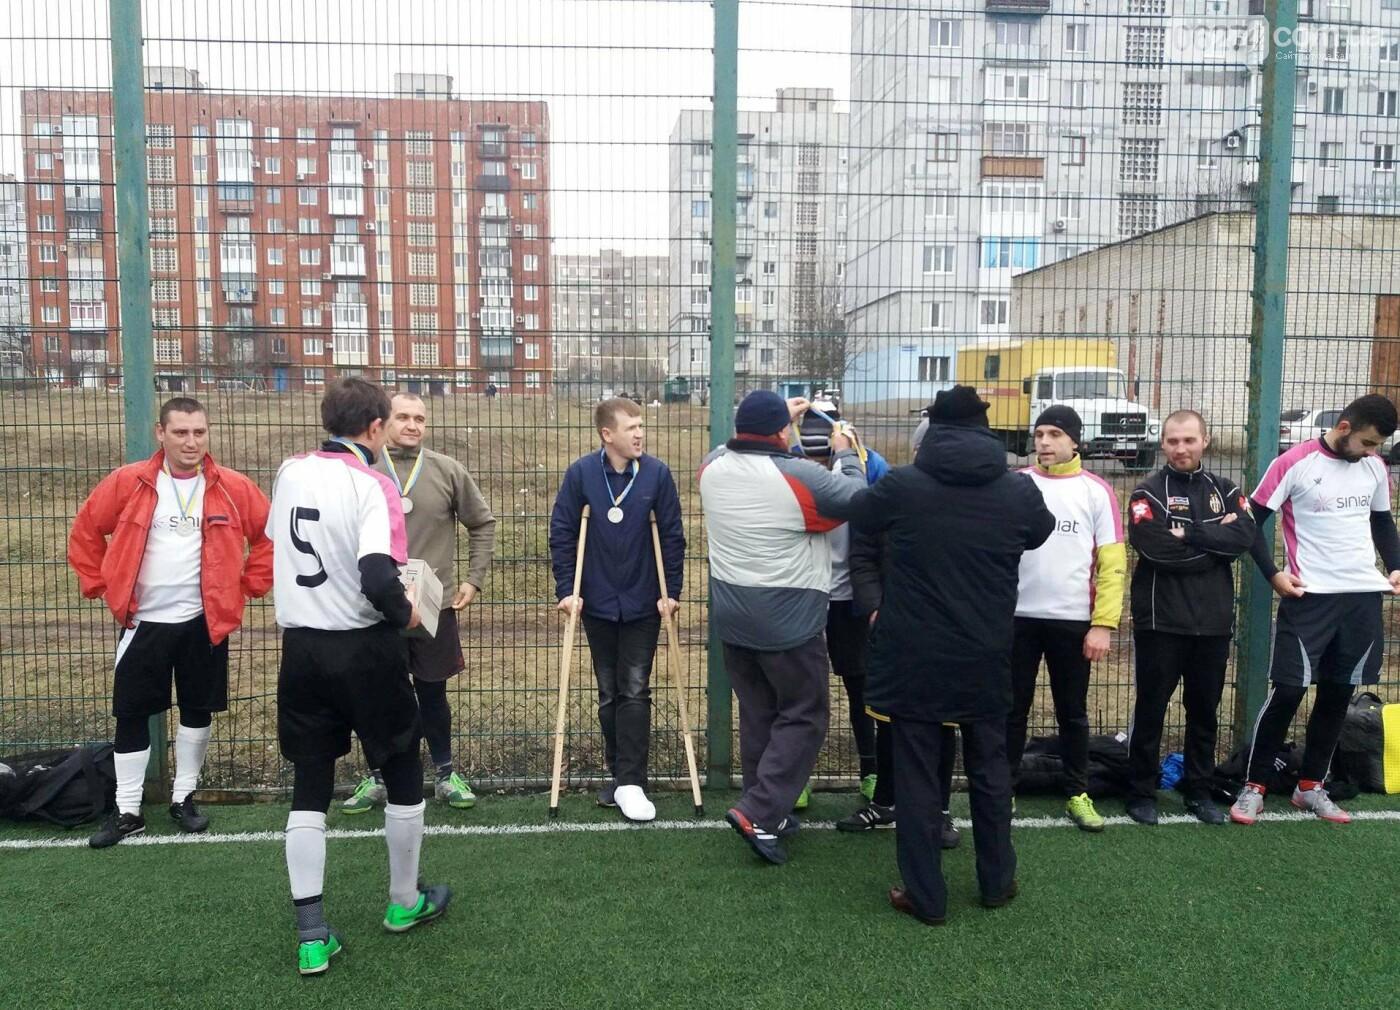 Кубок мэра по футболу из Бахмута отправился в Троицкое, фото-2